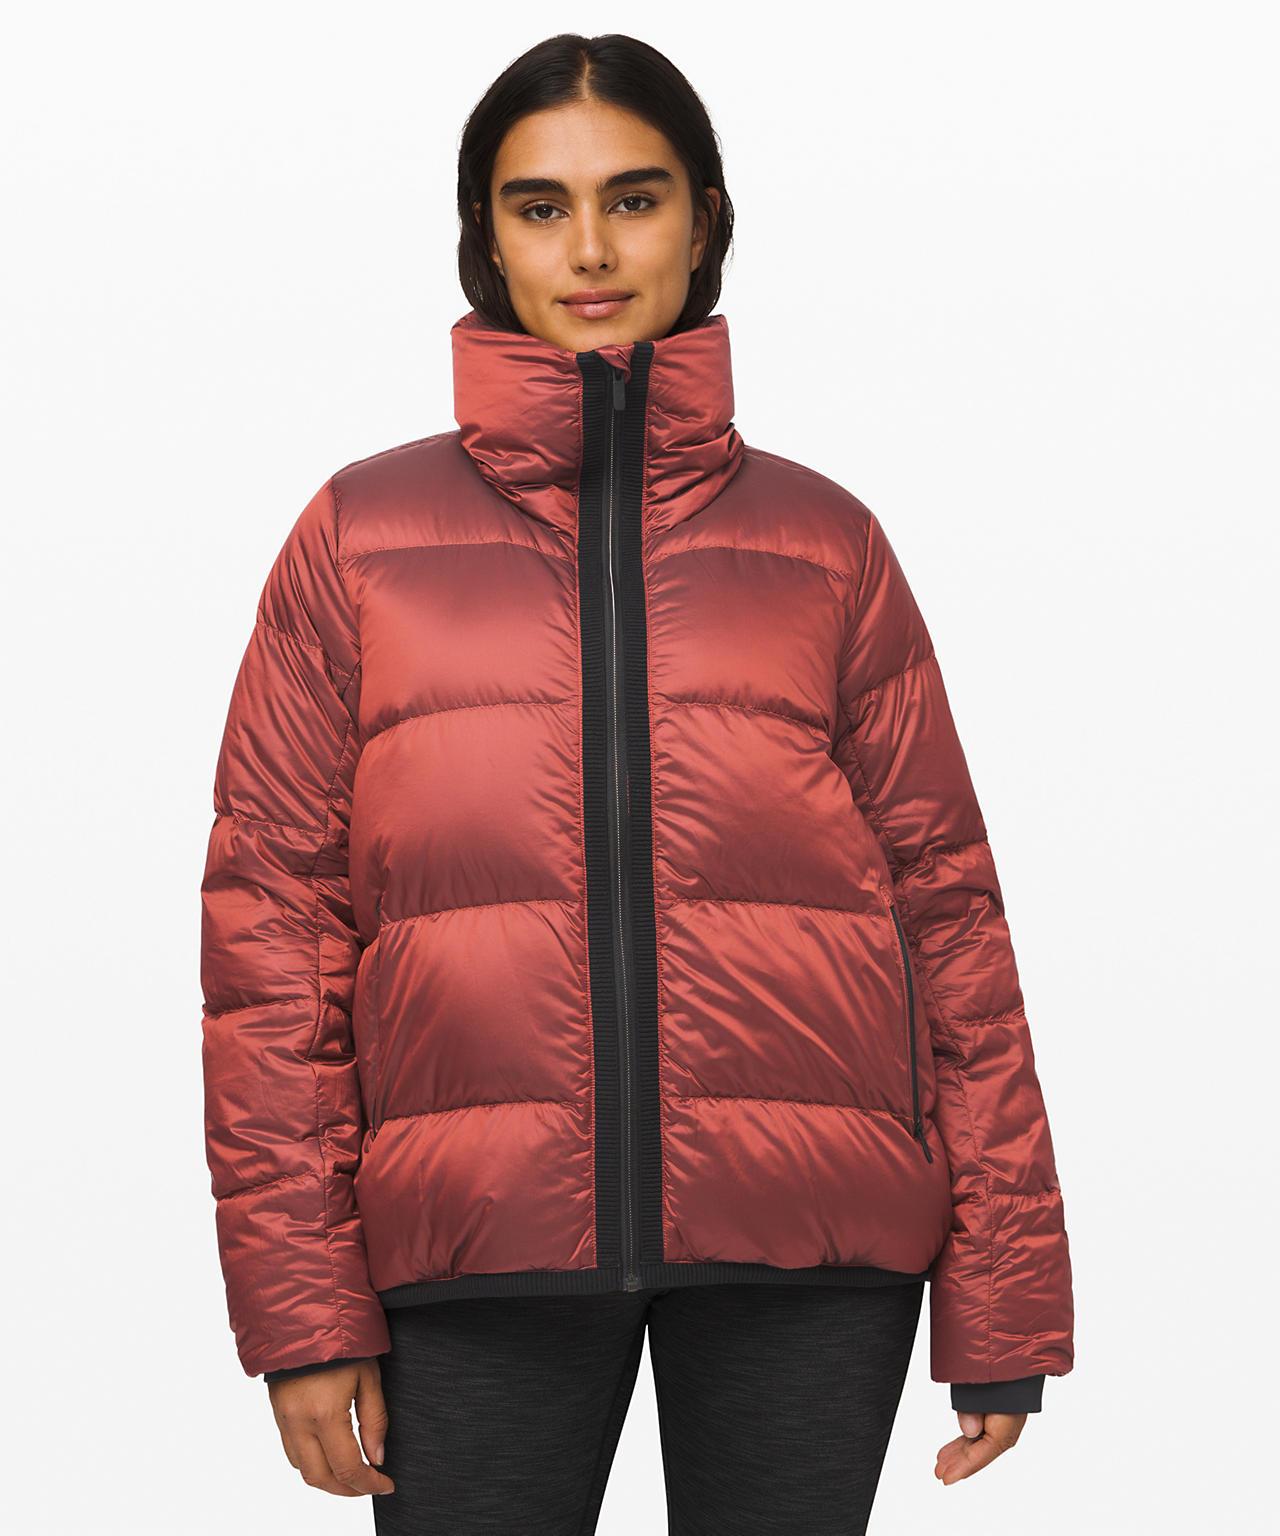 Cloudscape Jacket, Lululemon Upload